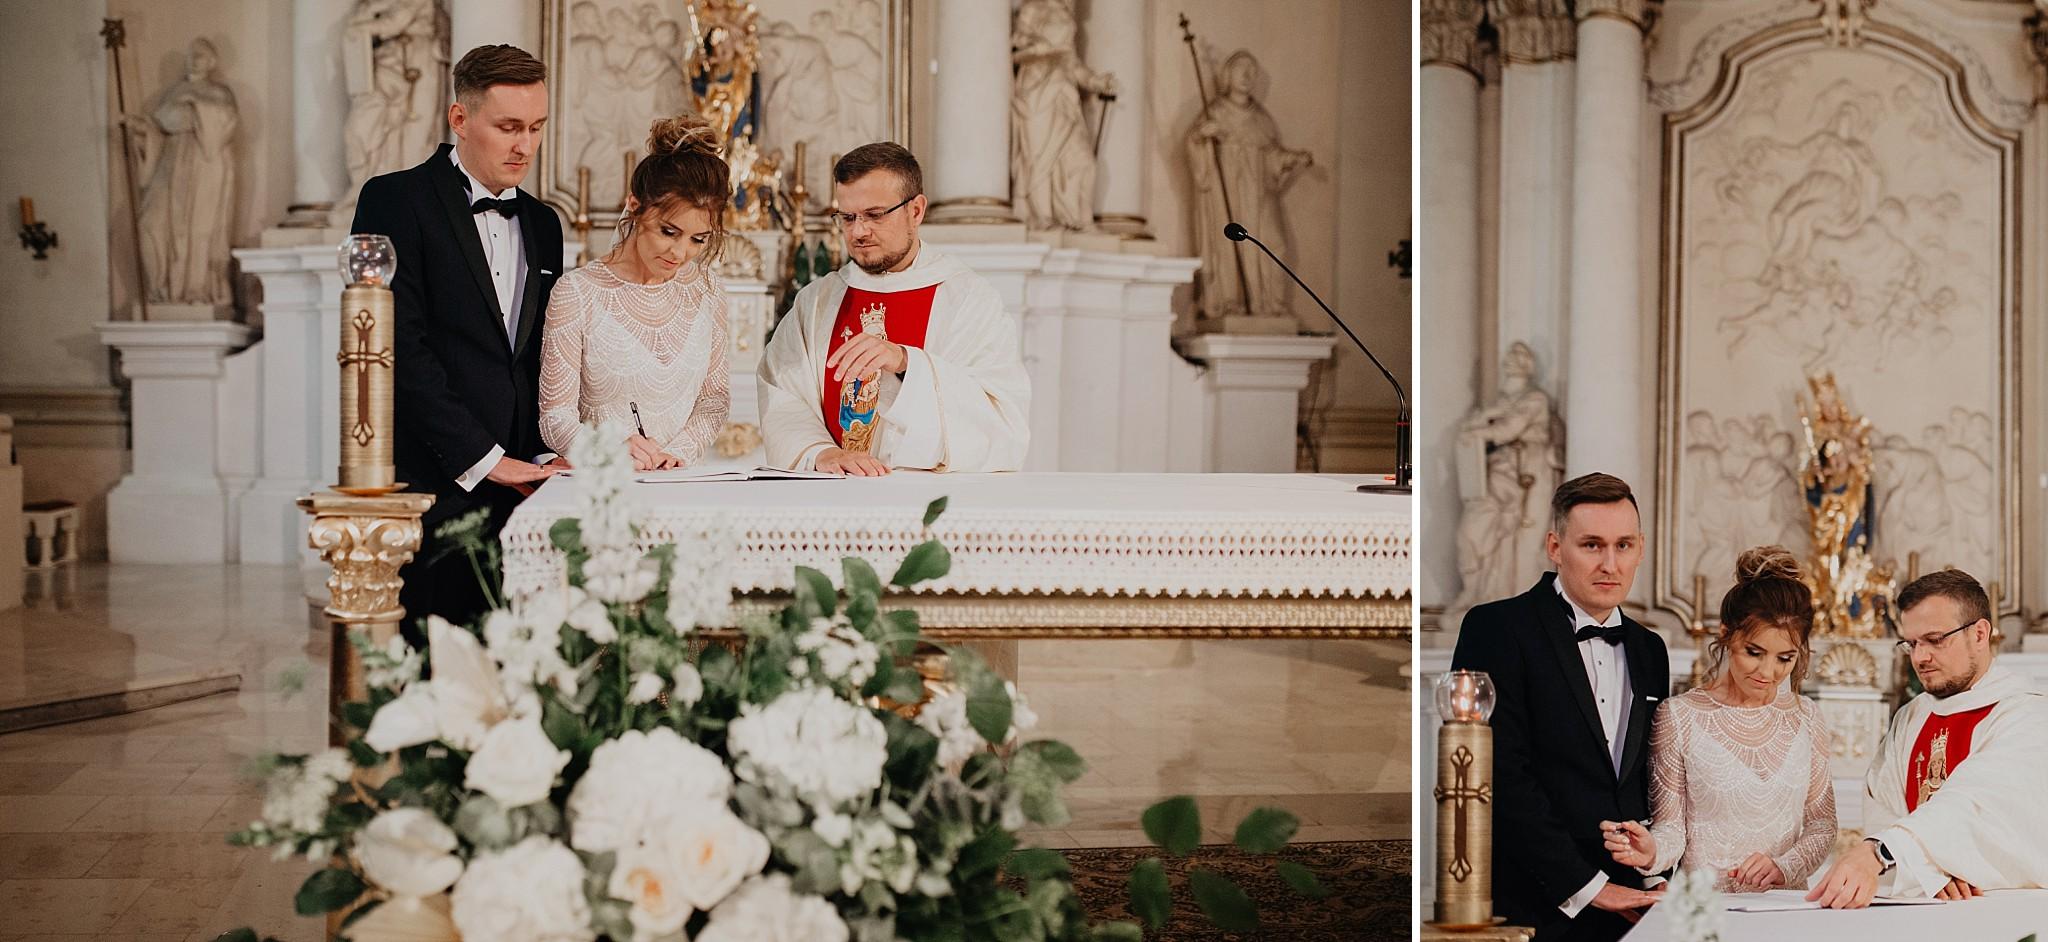 fotograf poznan wesele dobra truskawka piekne wesele pod poznaniem wesele w dobrej truskawce piekna para mloda slub marzen slub koronawirus slub listopad wesele koronawirus 202